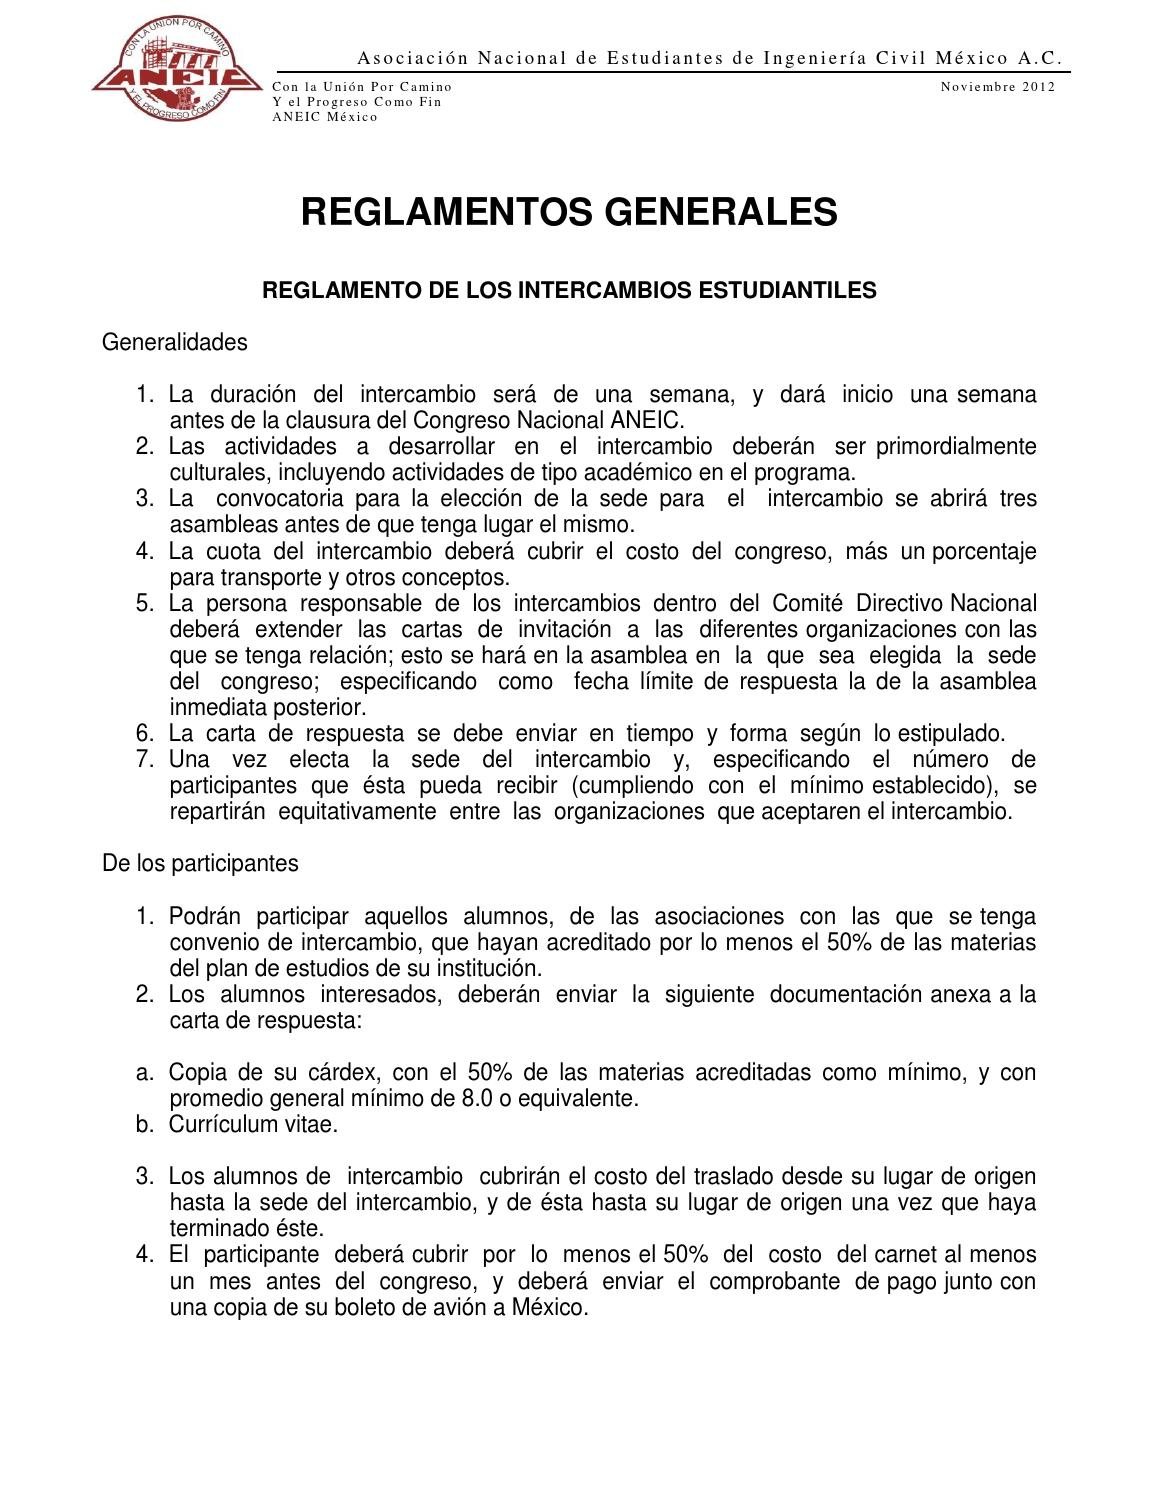 Reglamentos generales by ANEIC MÉxico - issuu